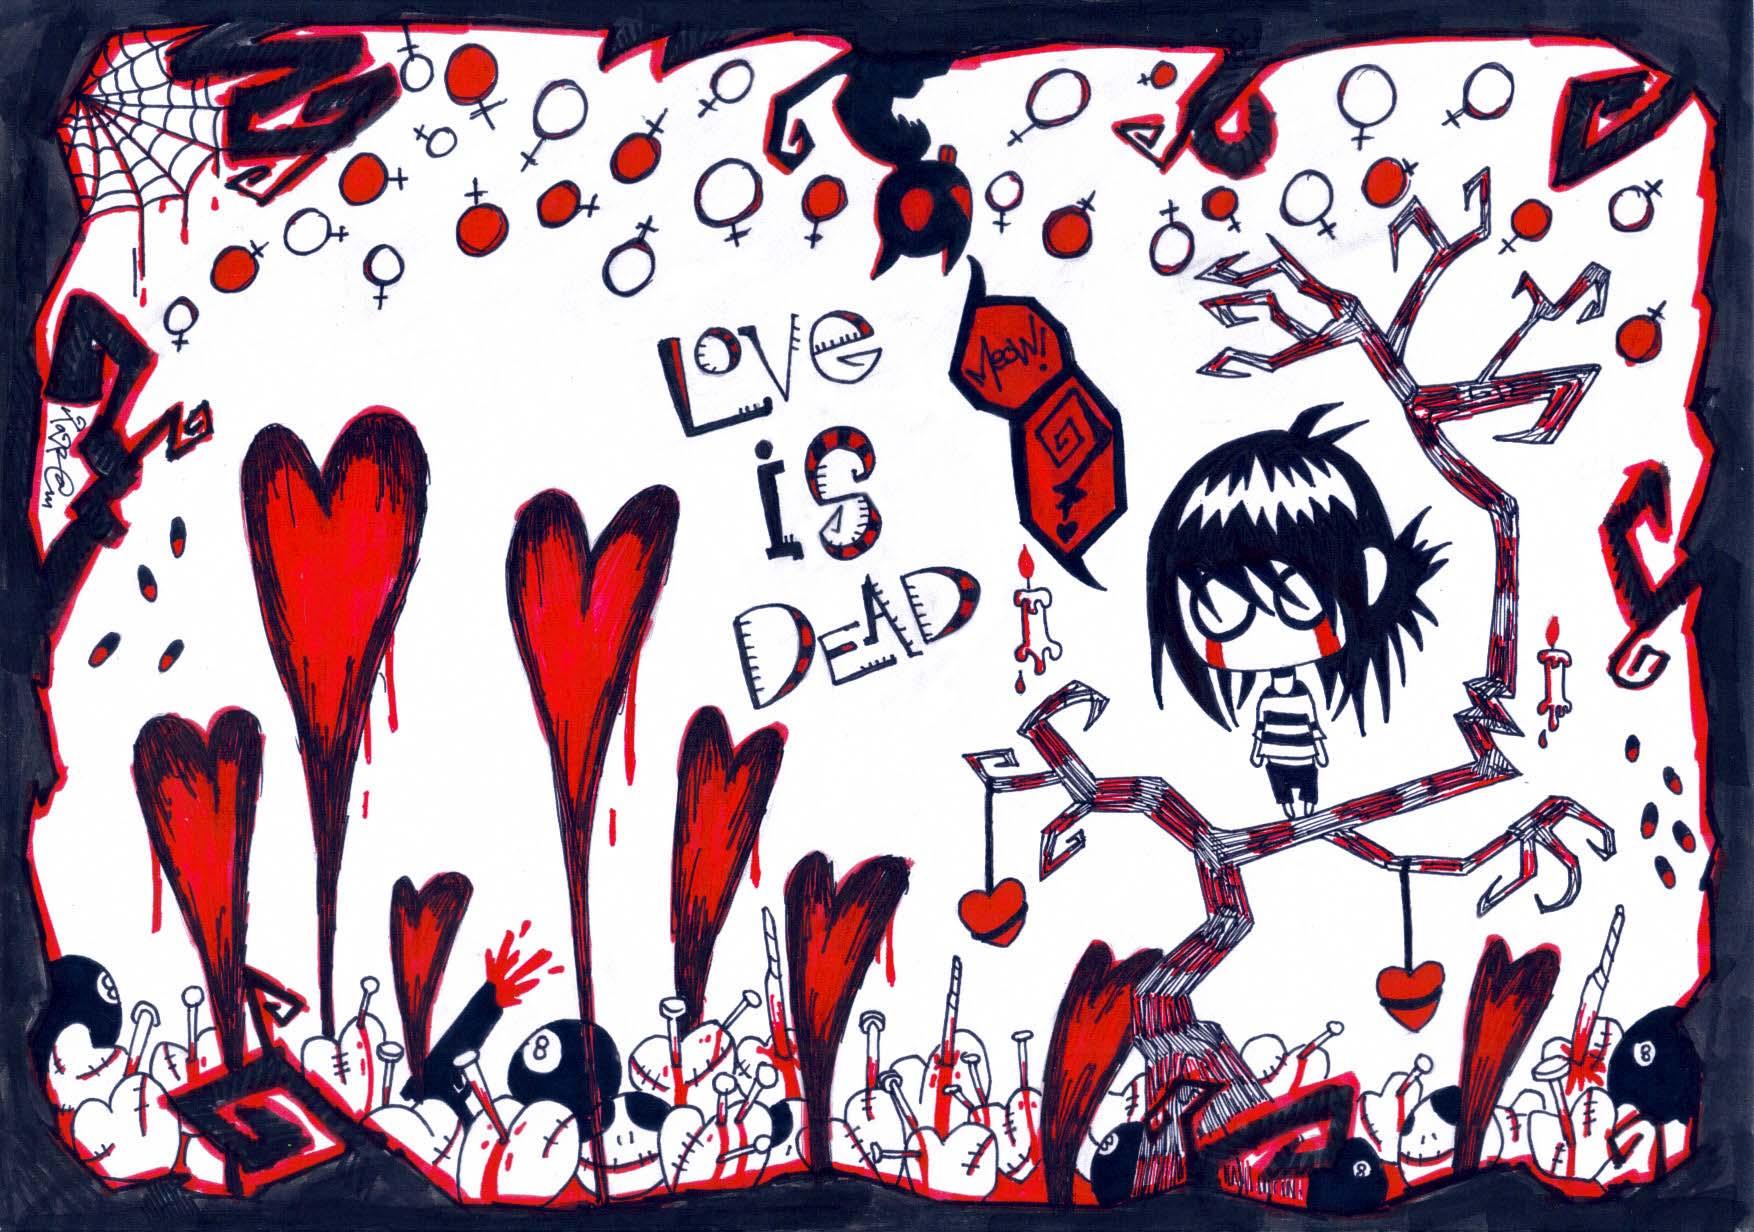 Tara's Dead World Doodlez